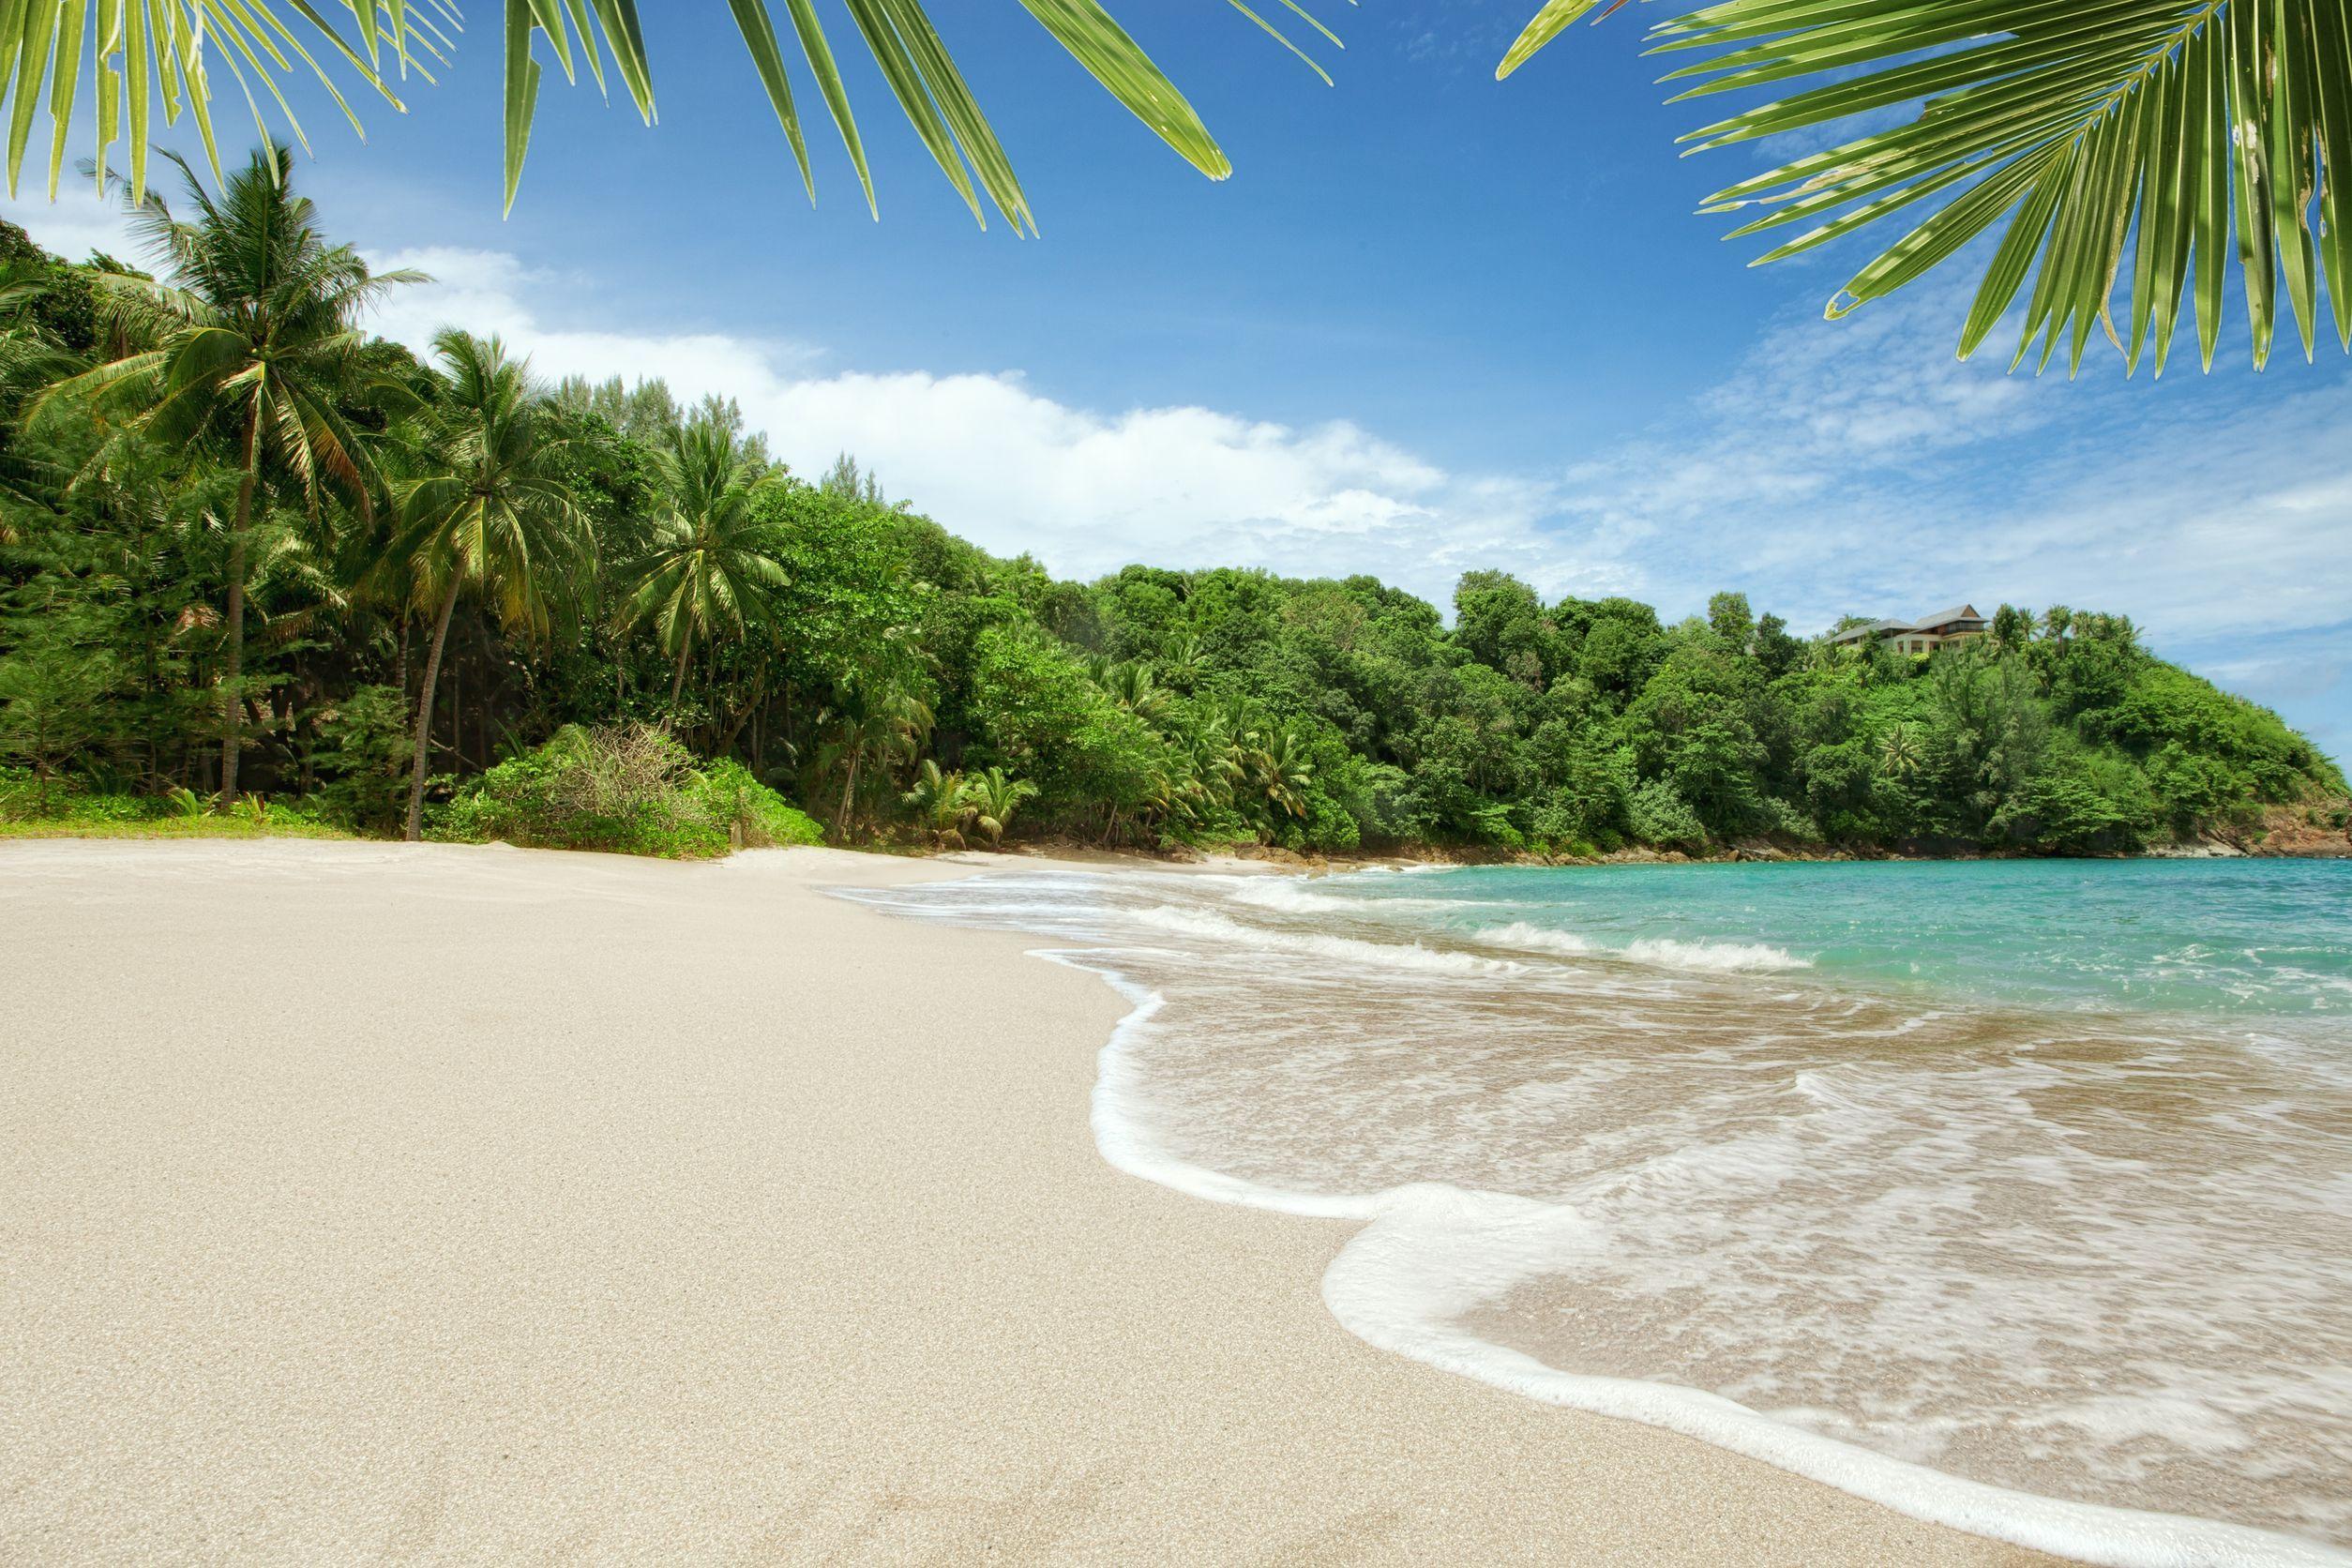 stunning-beach-seychelles-17935753.jpg (400×267) | Beaches - Heaven ...